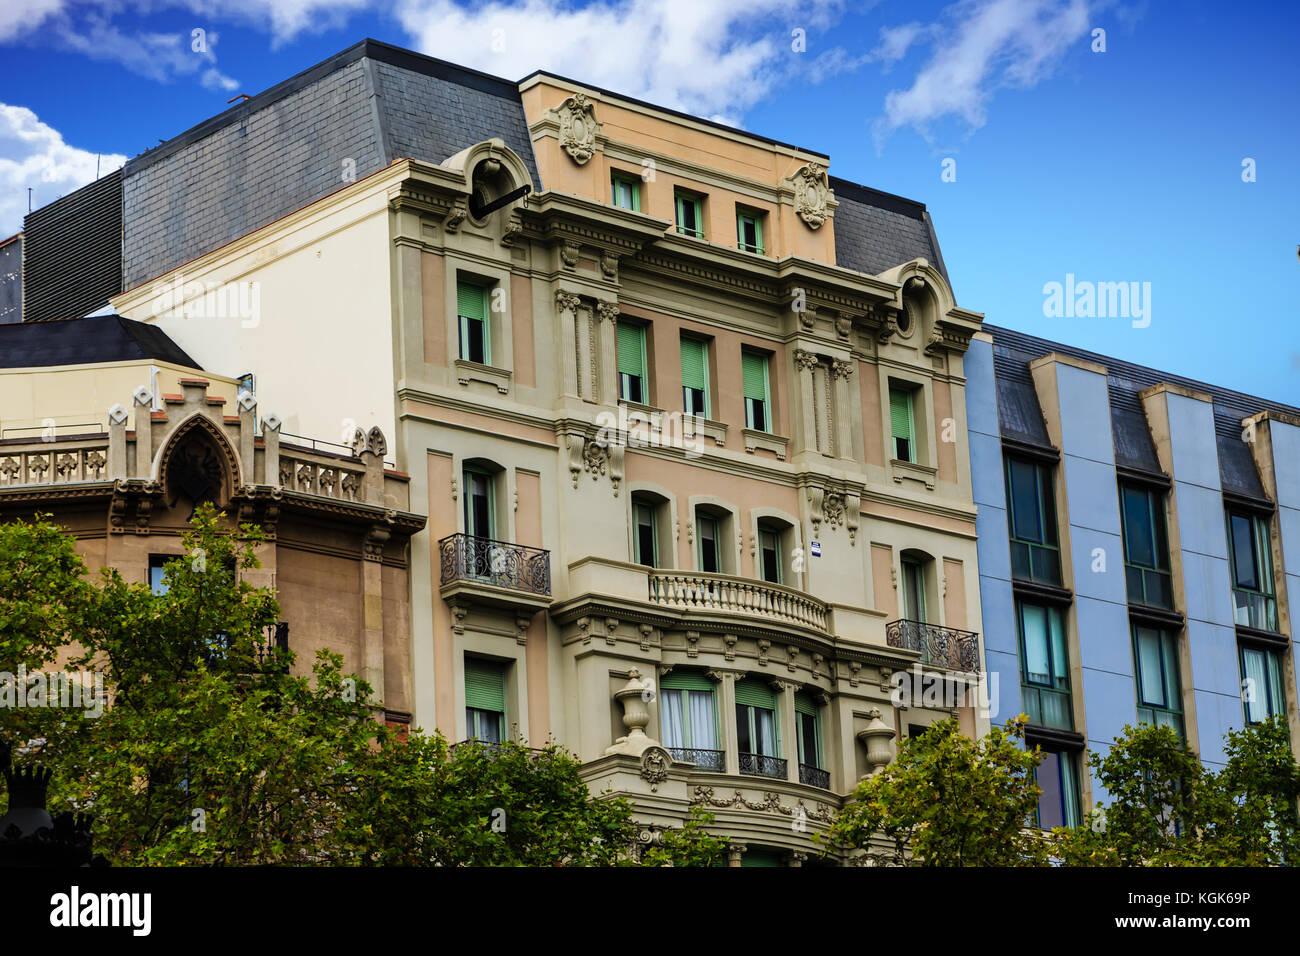 Apartments barcelona stock photos apartments barcelona for Barcelona apartment